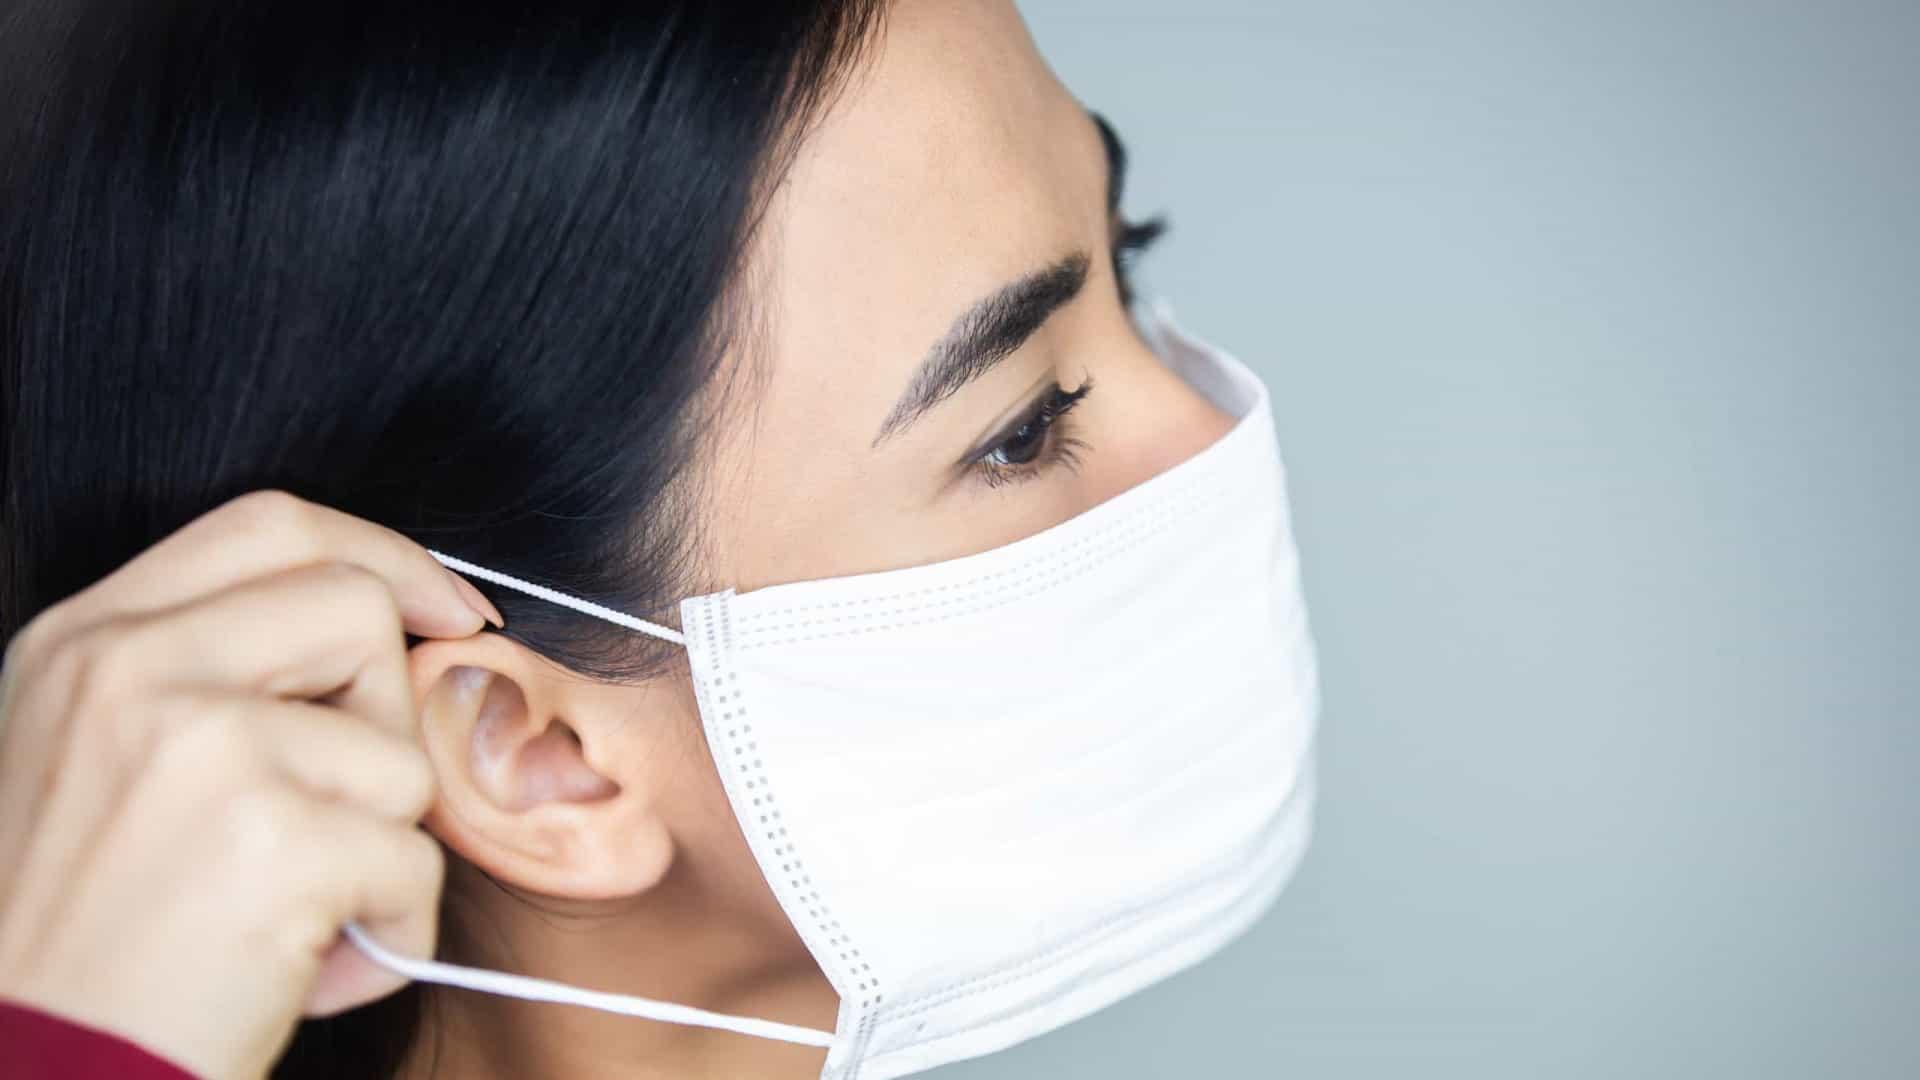 Uso de máscara será obrigatório no comércio de Santa Catarina